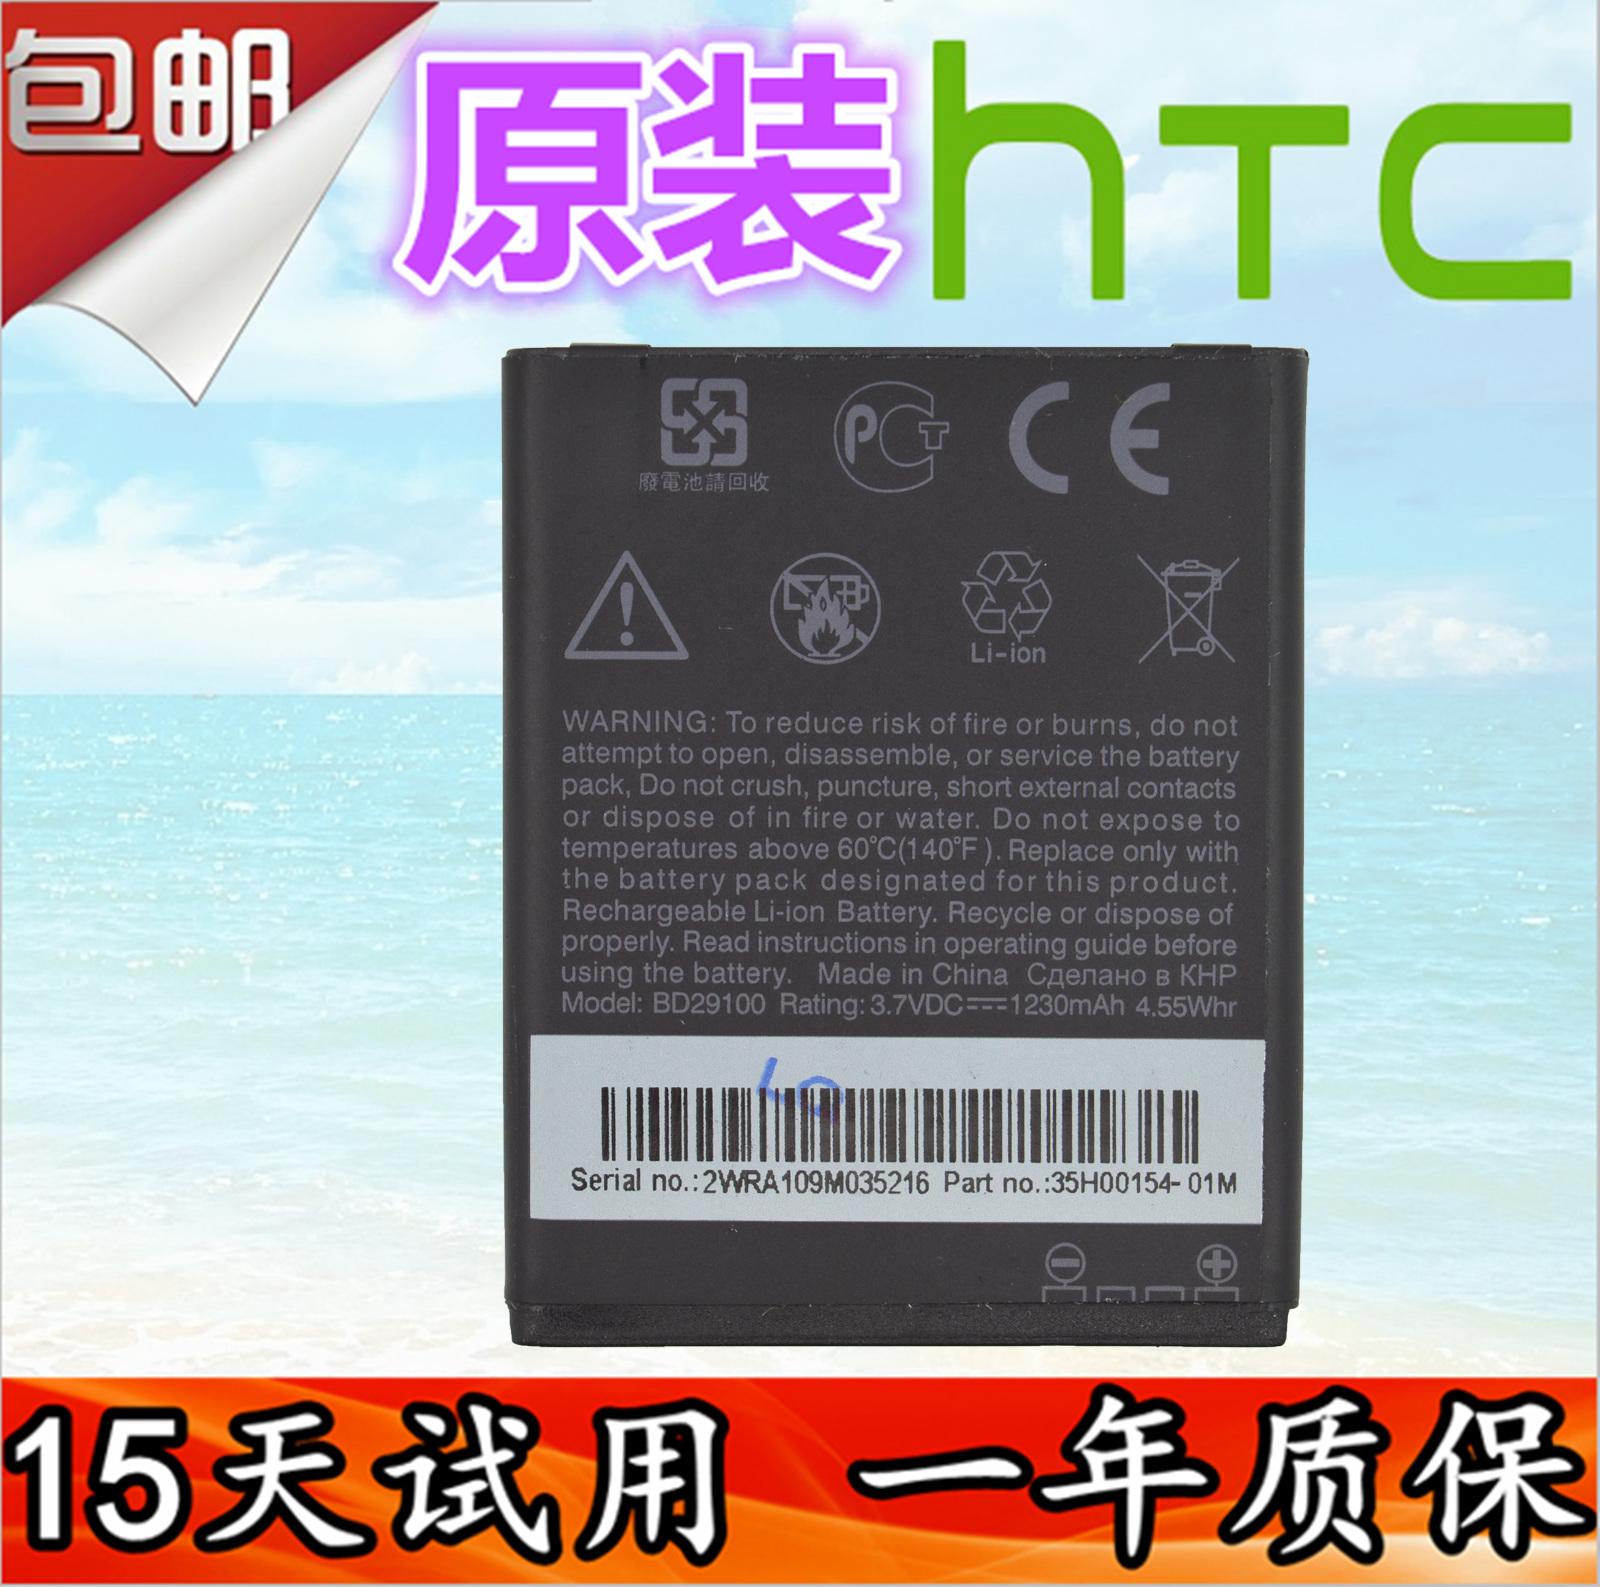 HTC G13 HD7 T9292 A510e A510C 野火S 电池 BD29100原装手机电池